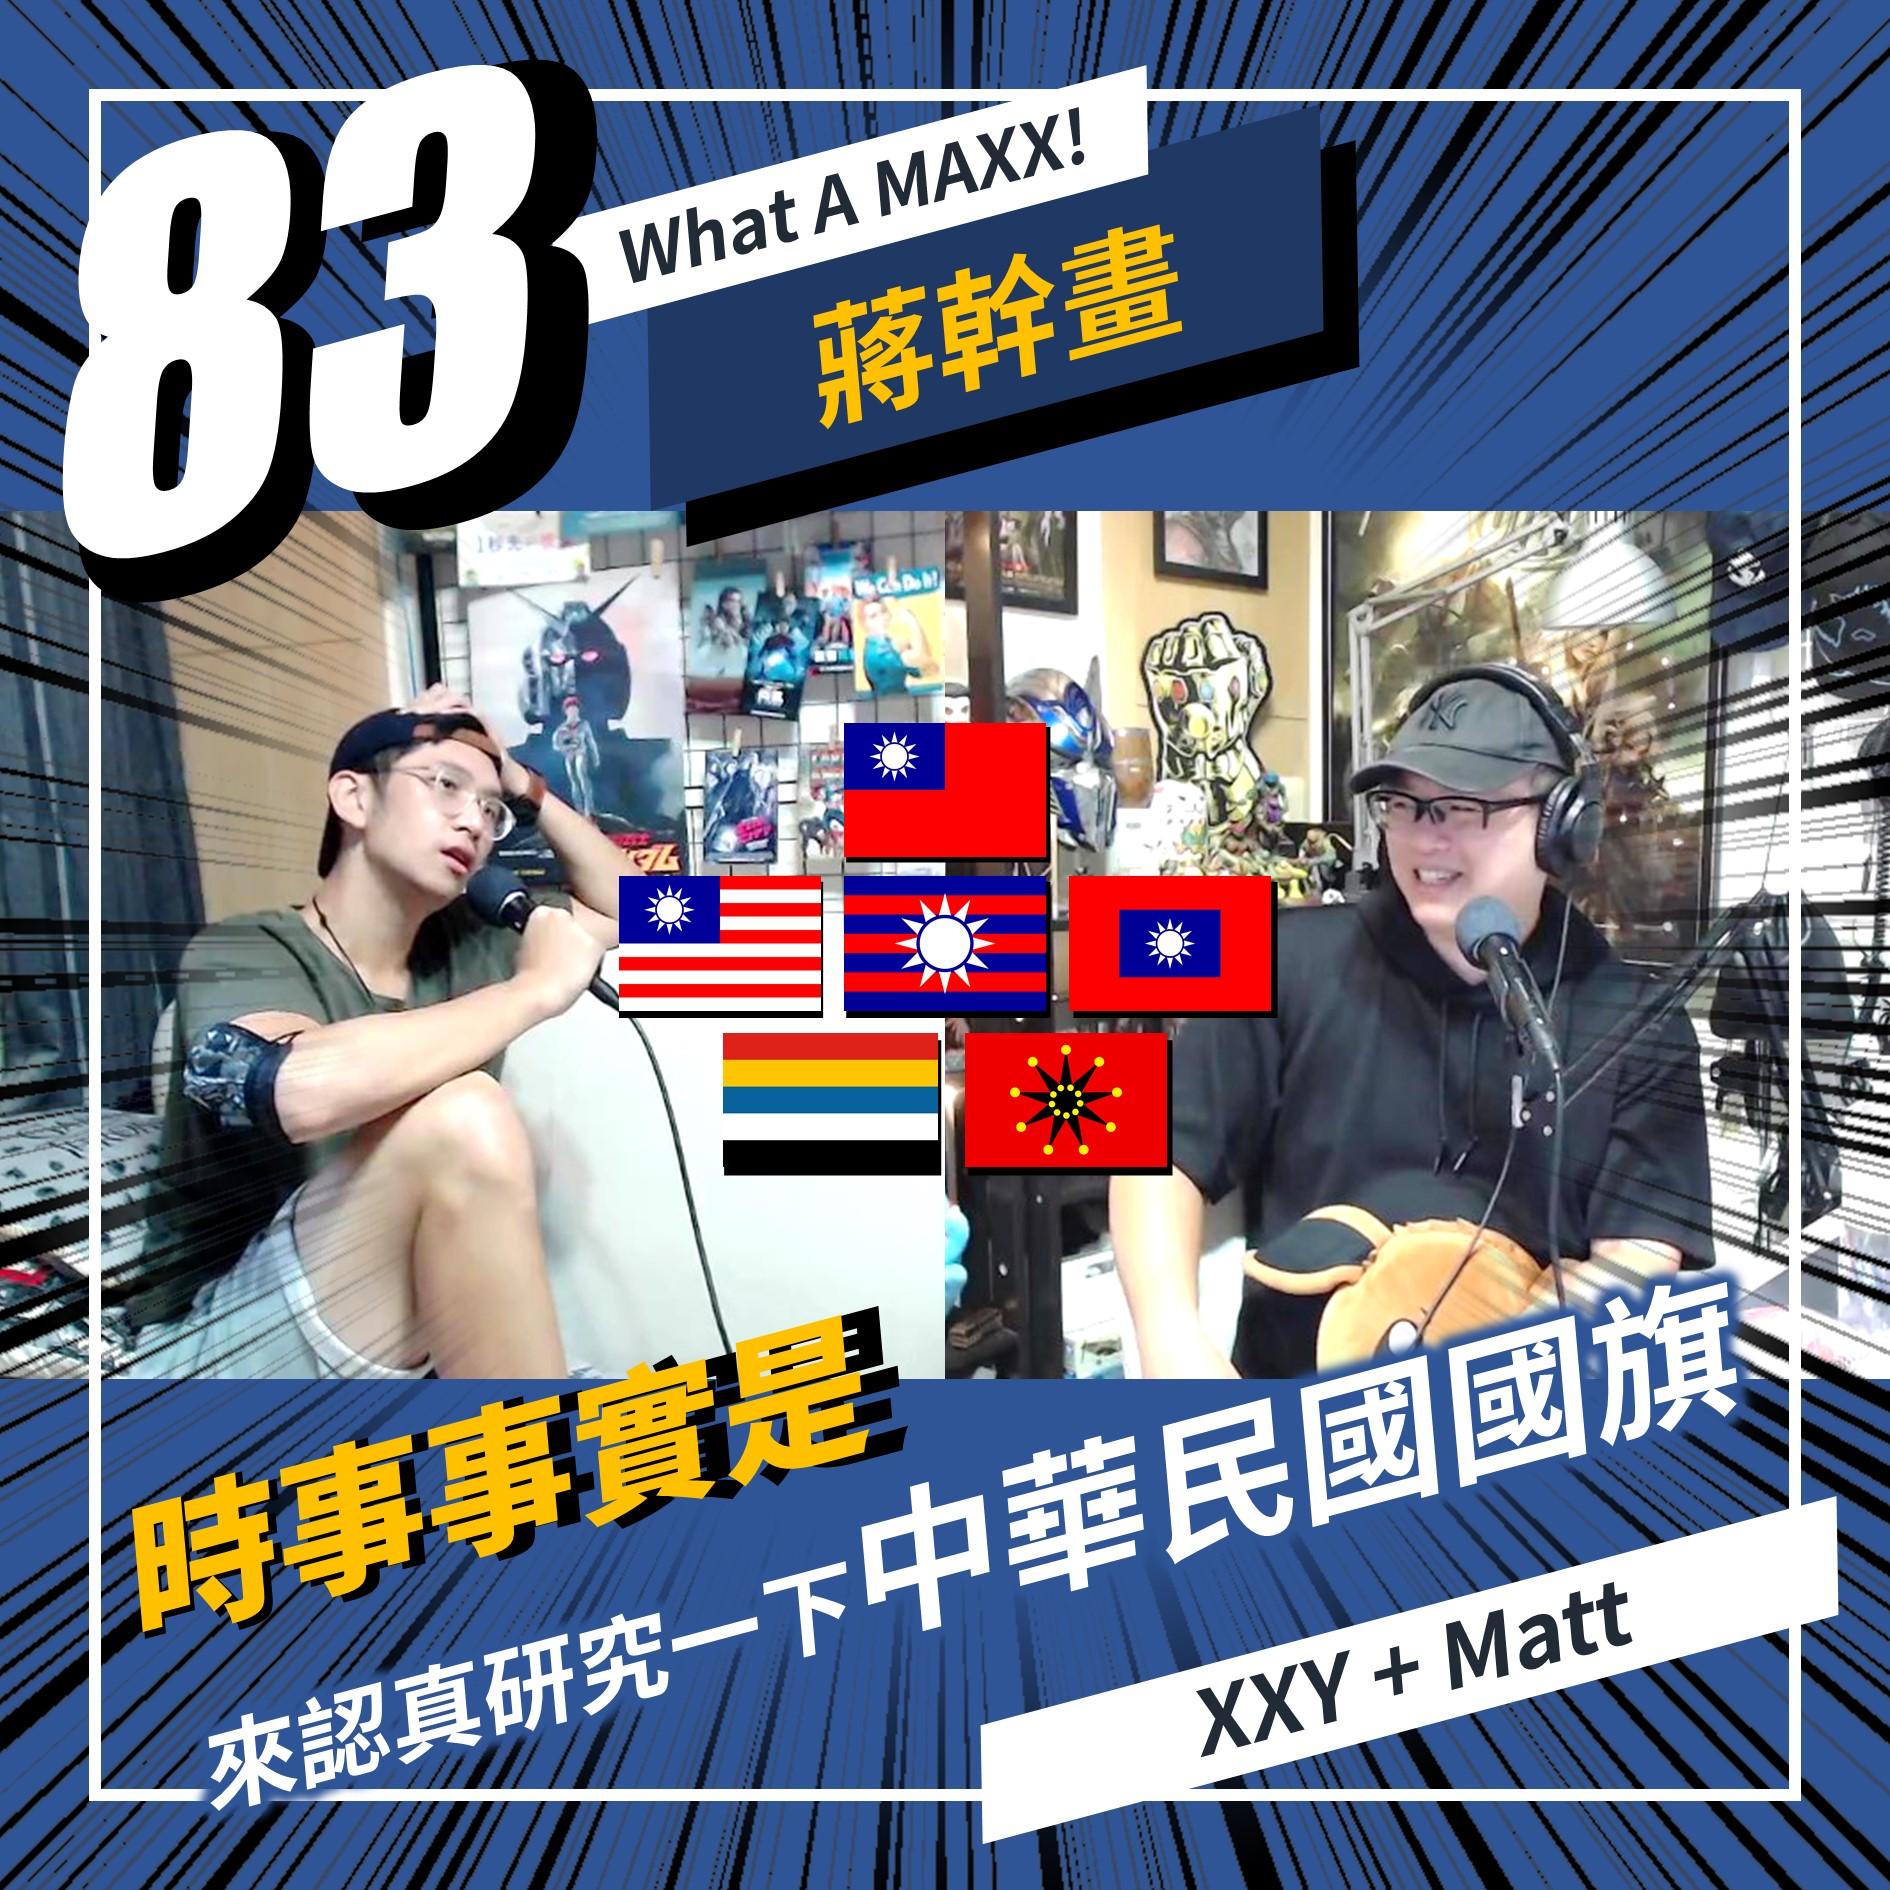 【What A MAXX! 蔣幹畫】EP. 083 - 時事事實是... 來認真研究一下中華民國國旗!   XXY + MATT